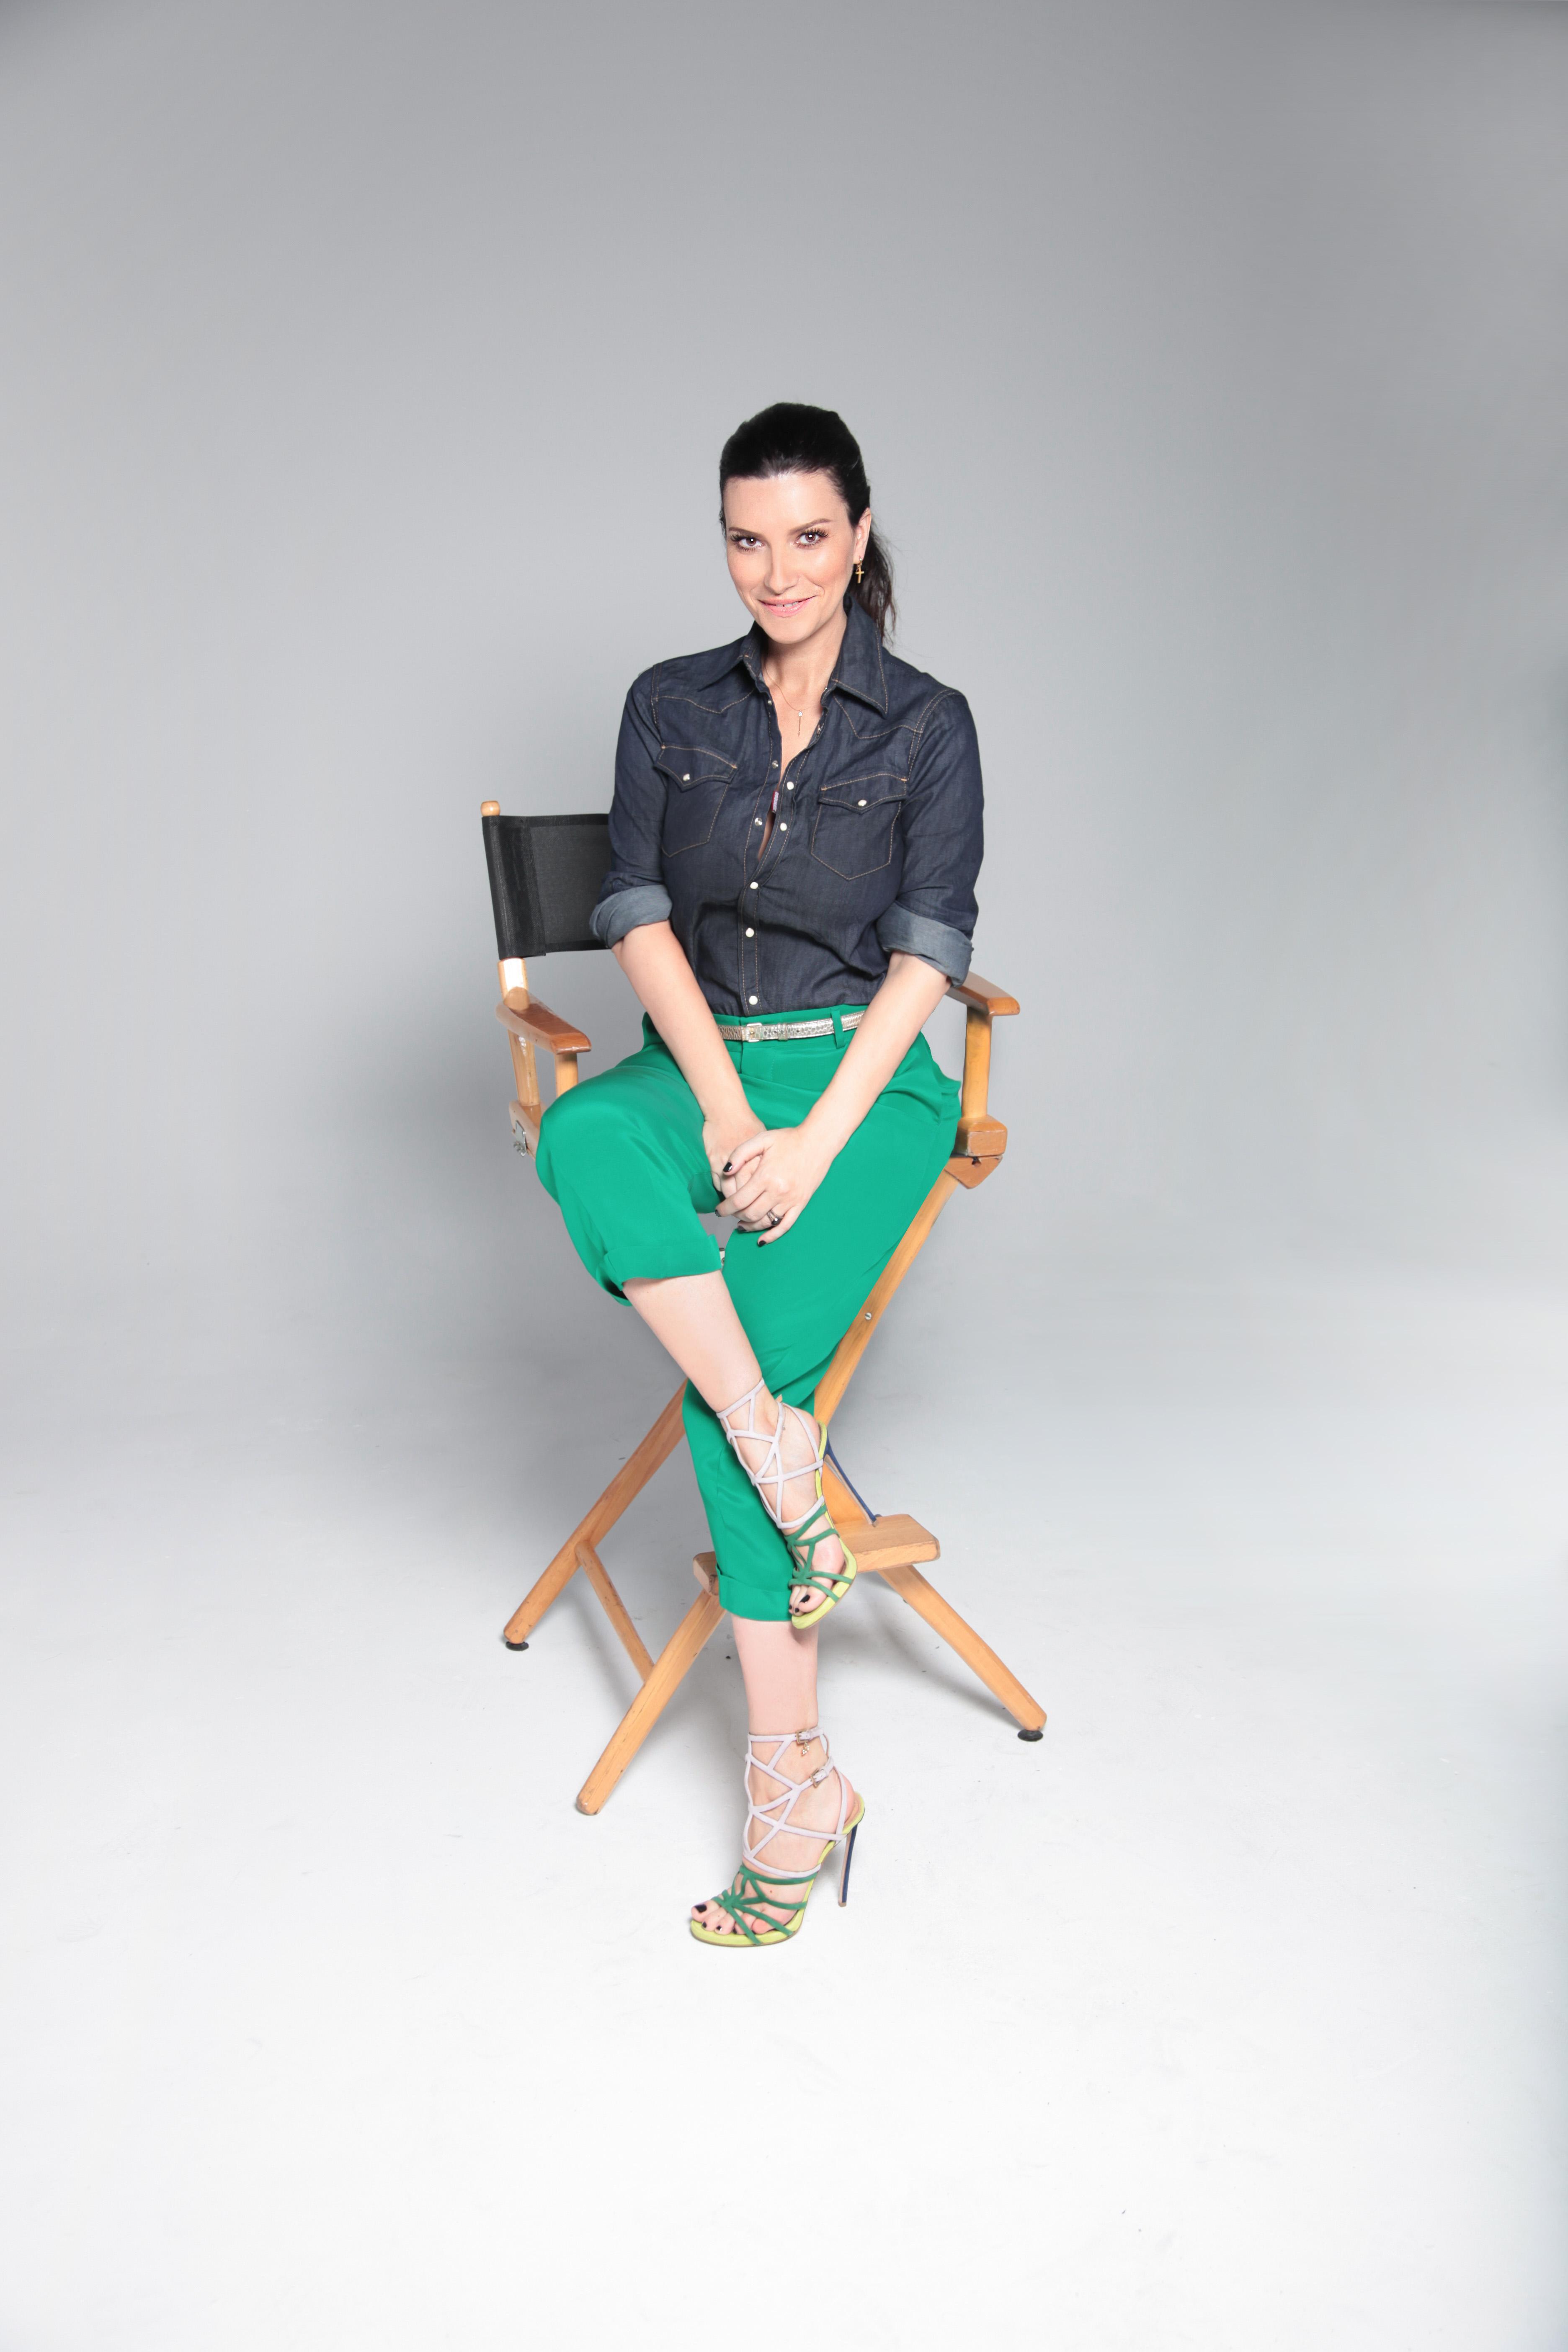 Laura Pausini ph Leandro Manuel Emede